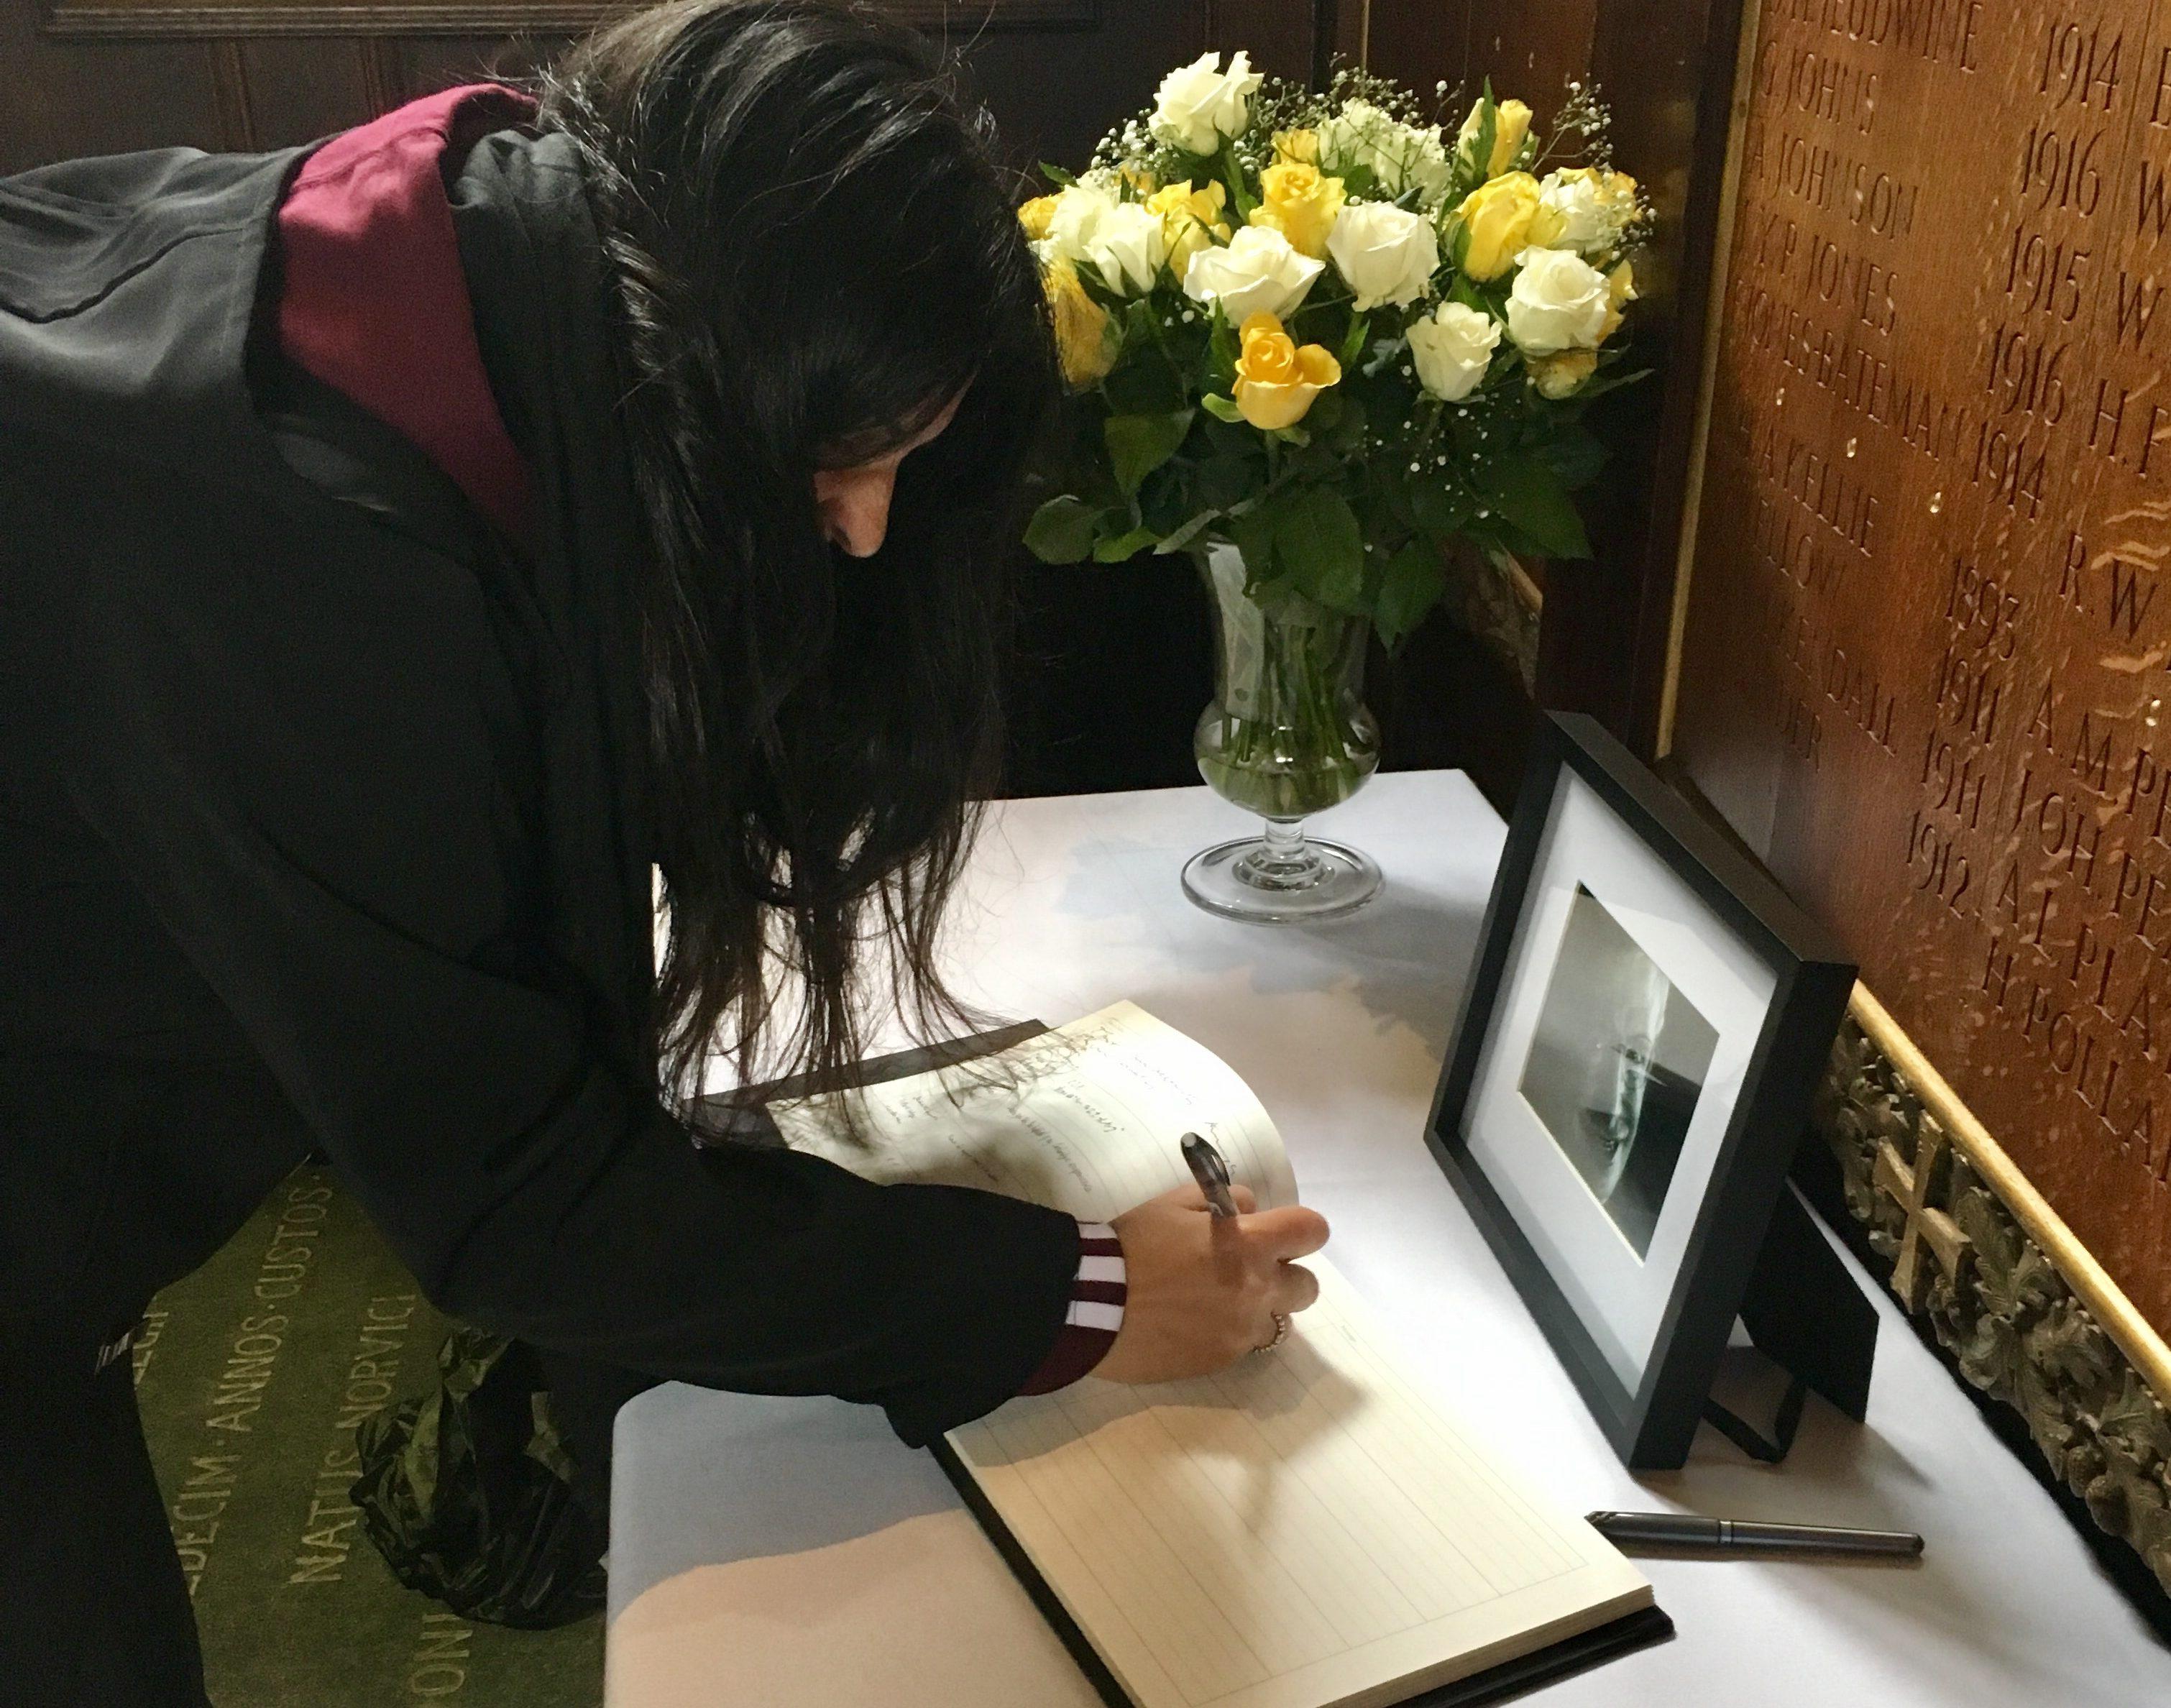 Ada Monserrat signs Stephen Hawking's book of condolences on behalf of FIU.